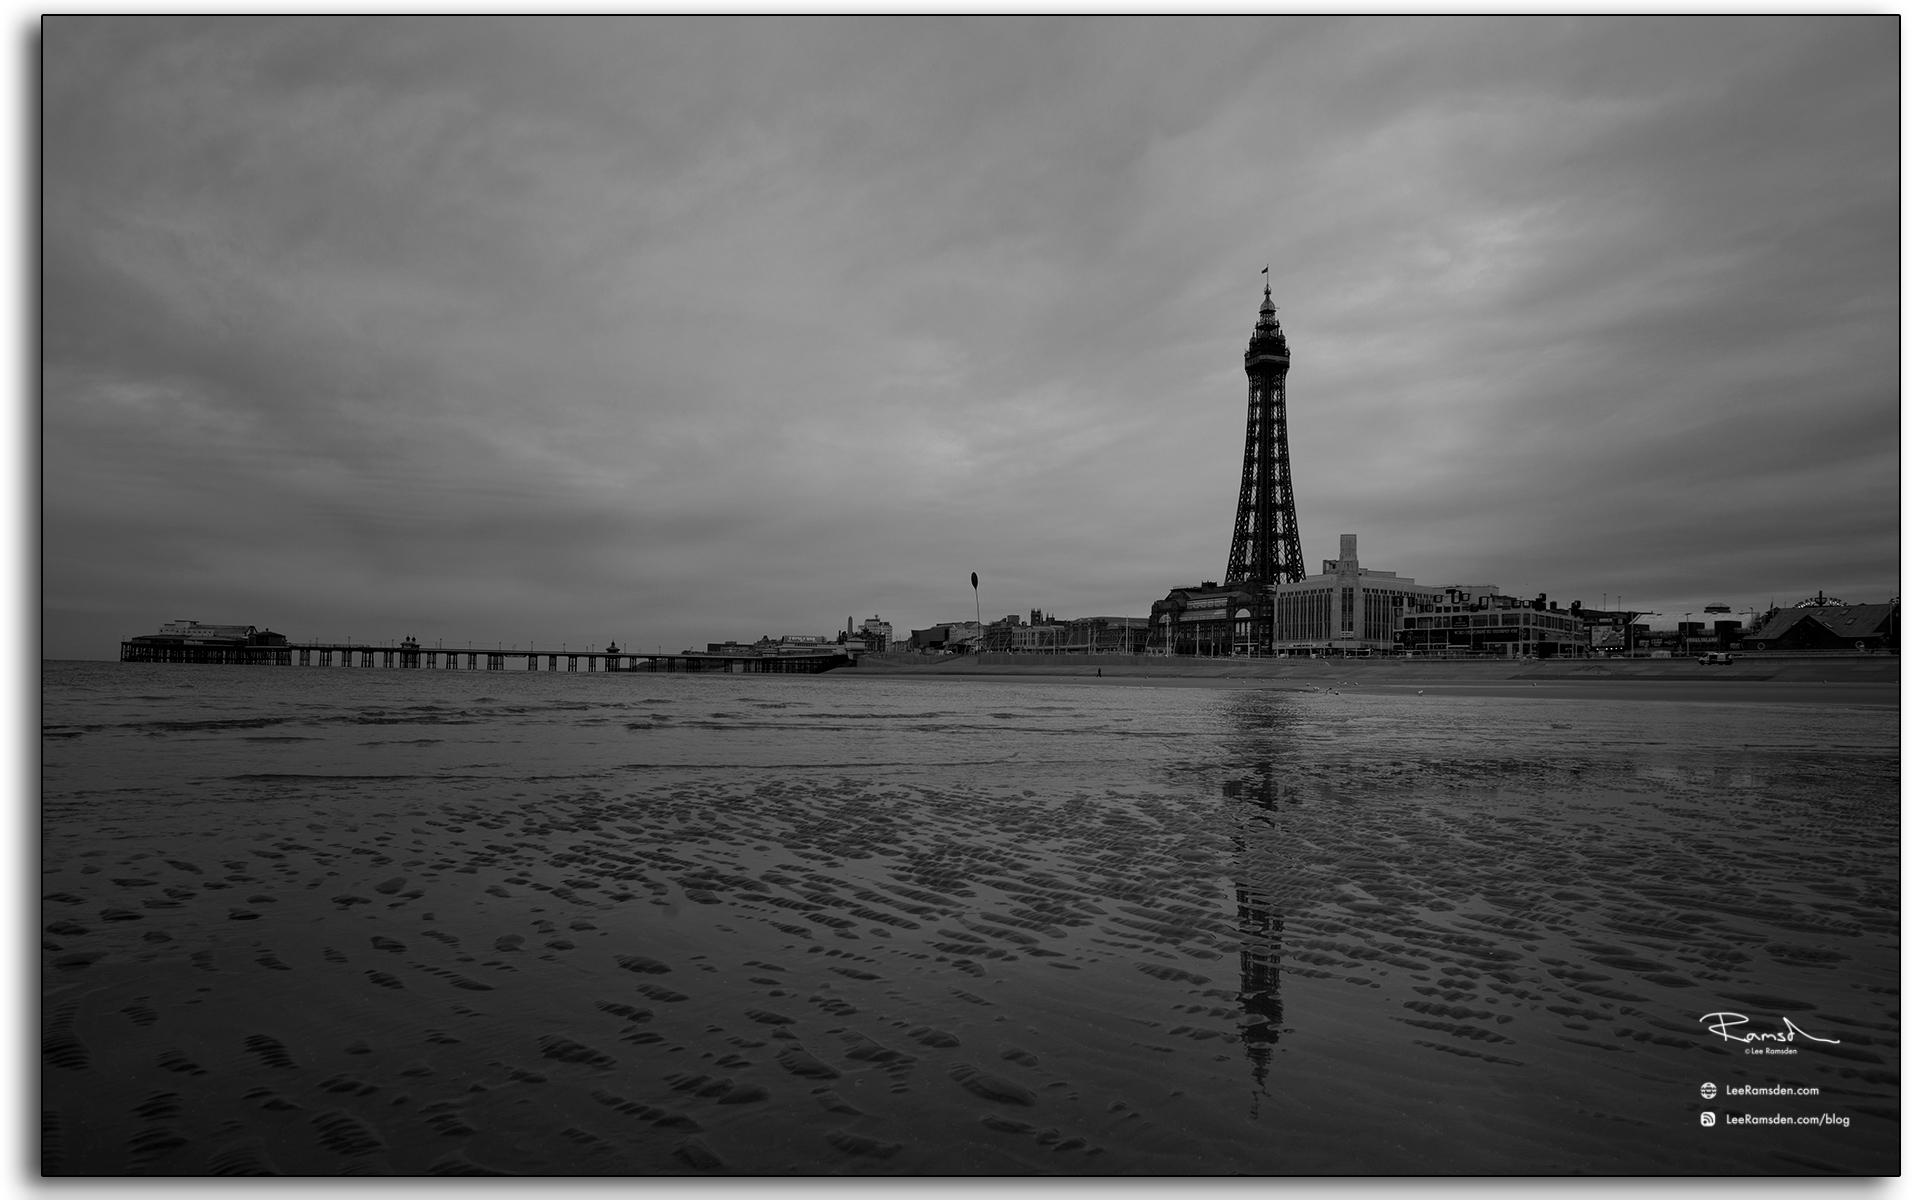 Blackpool, Blackpool tower, monochrome, black white, reflection, Lancashire photographer, Lee Ramsden